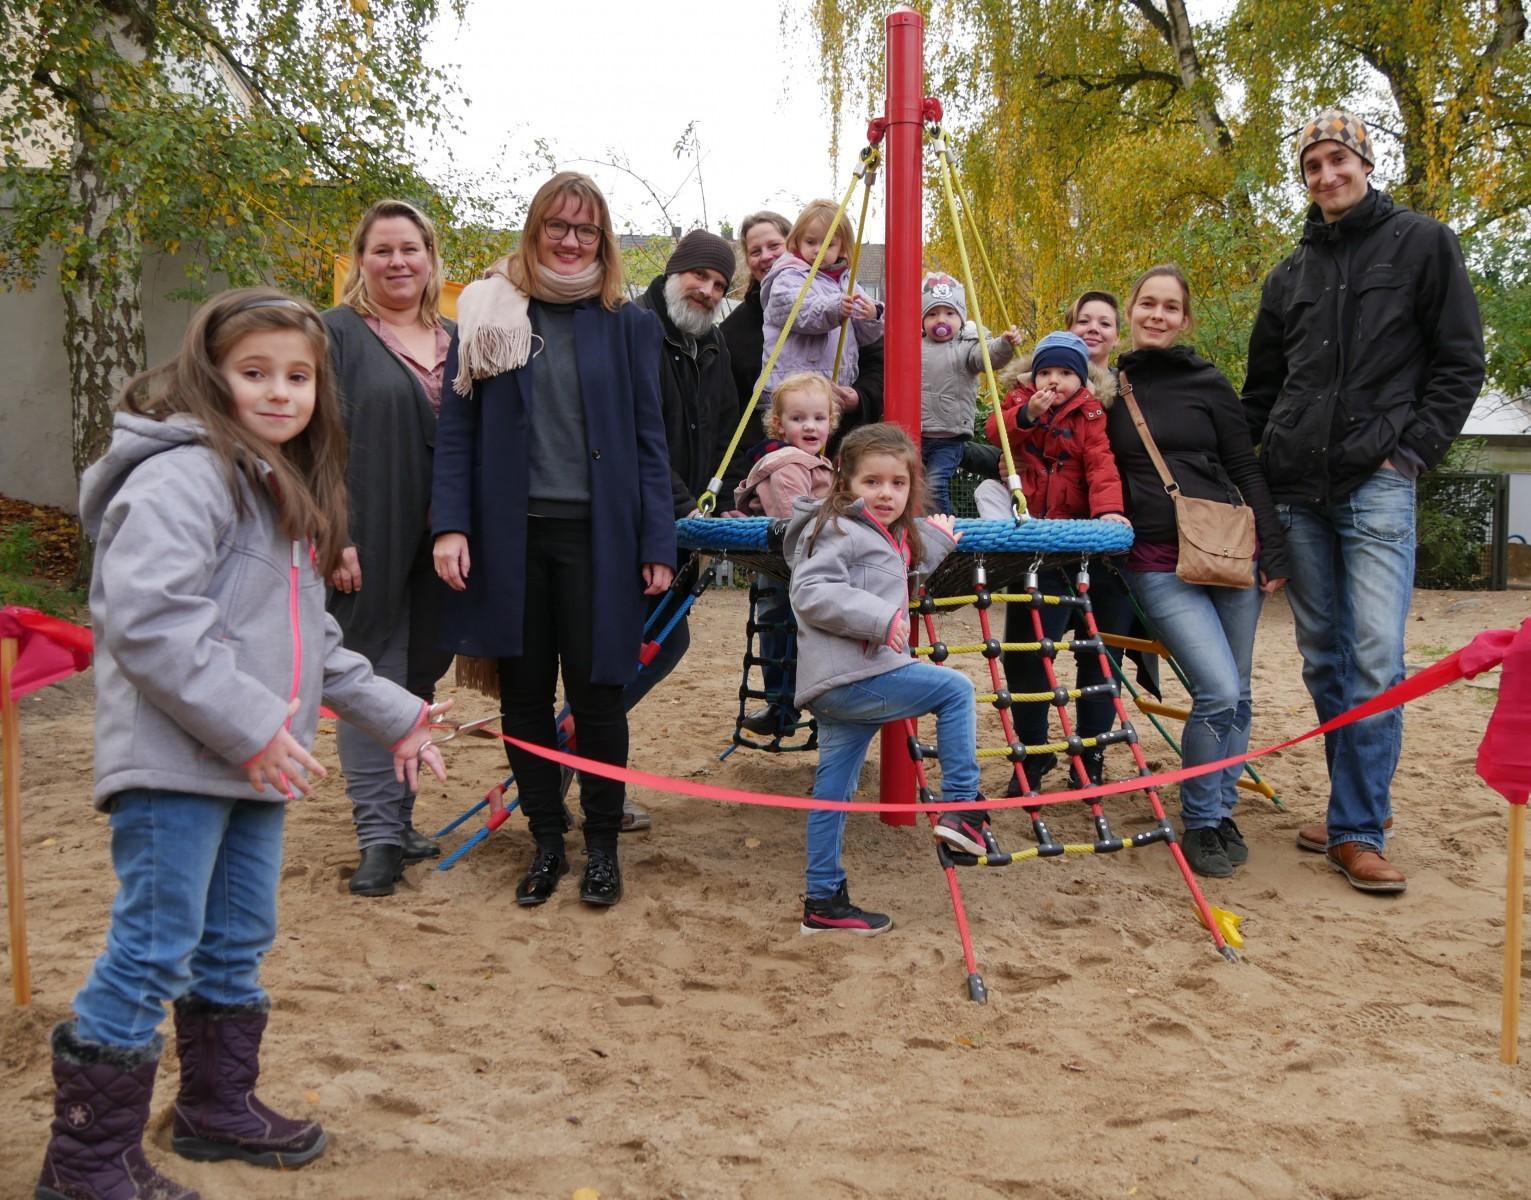 Klettergerüst English : Kindertagesstätte st josef erhält neues klettergerüst